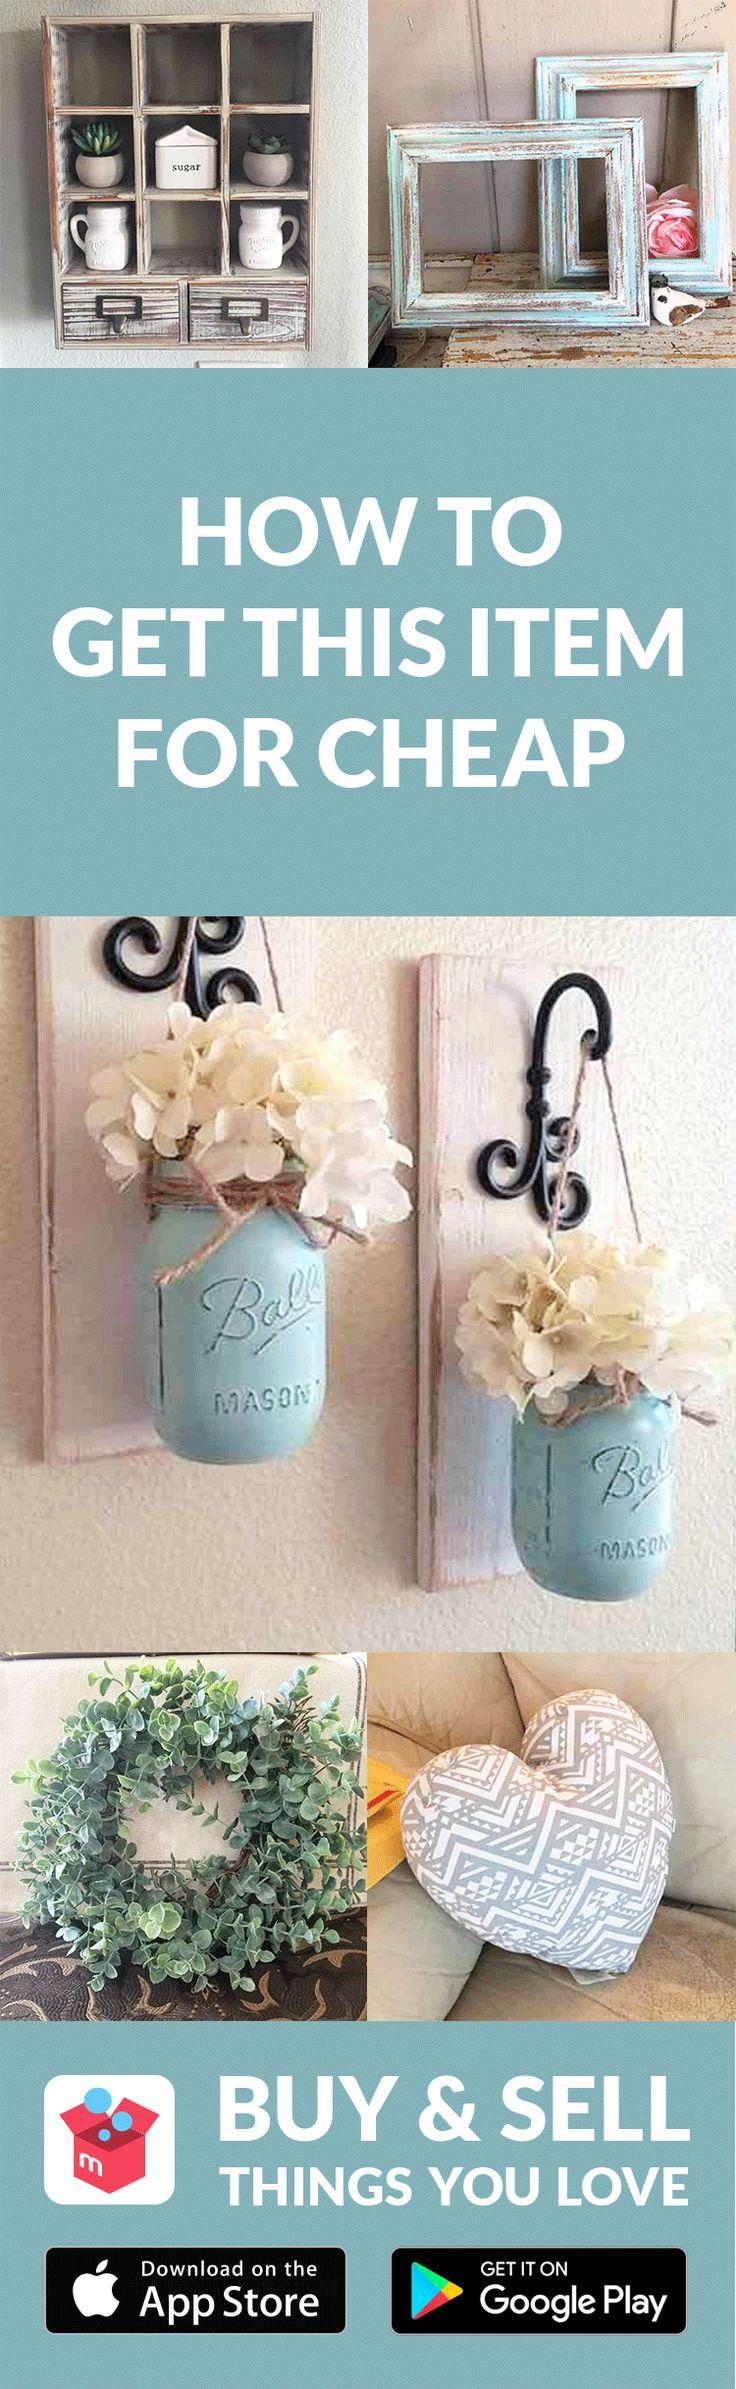 Best 25 Teen Bathroom Decor Ideas On Pinterest Teen Bathroom Girl Girl Bathroom Decor And